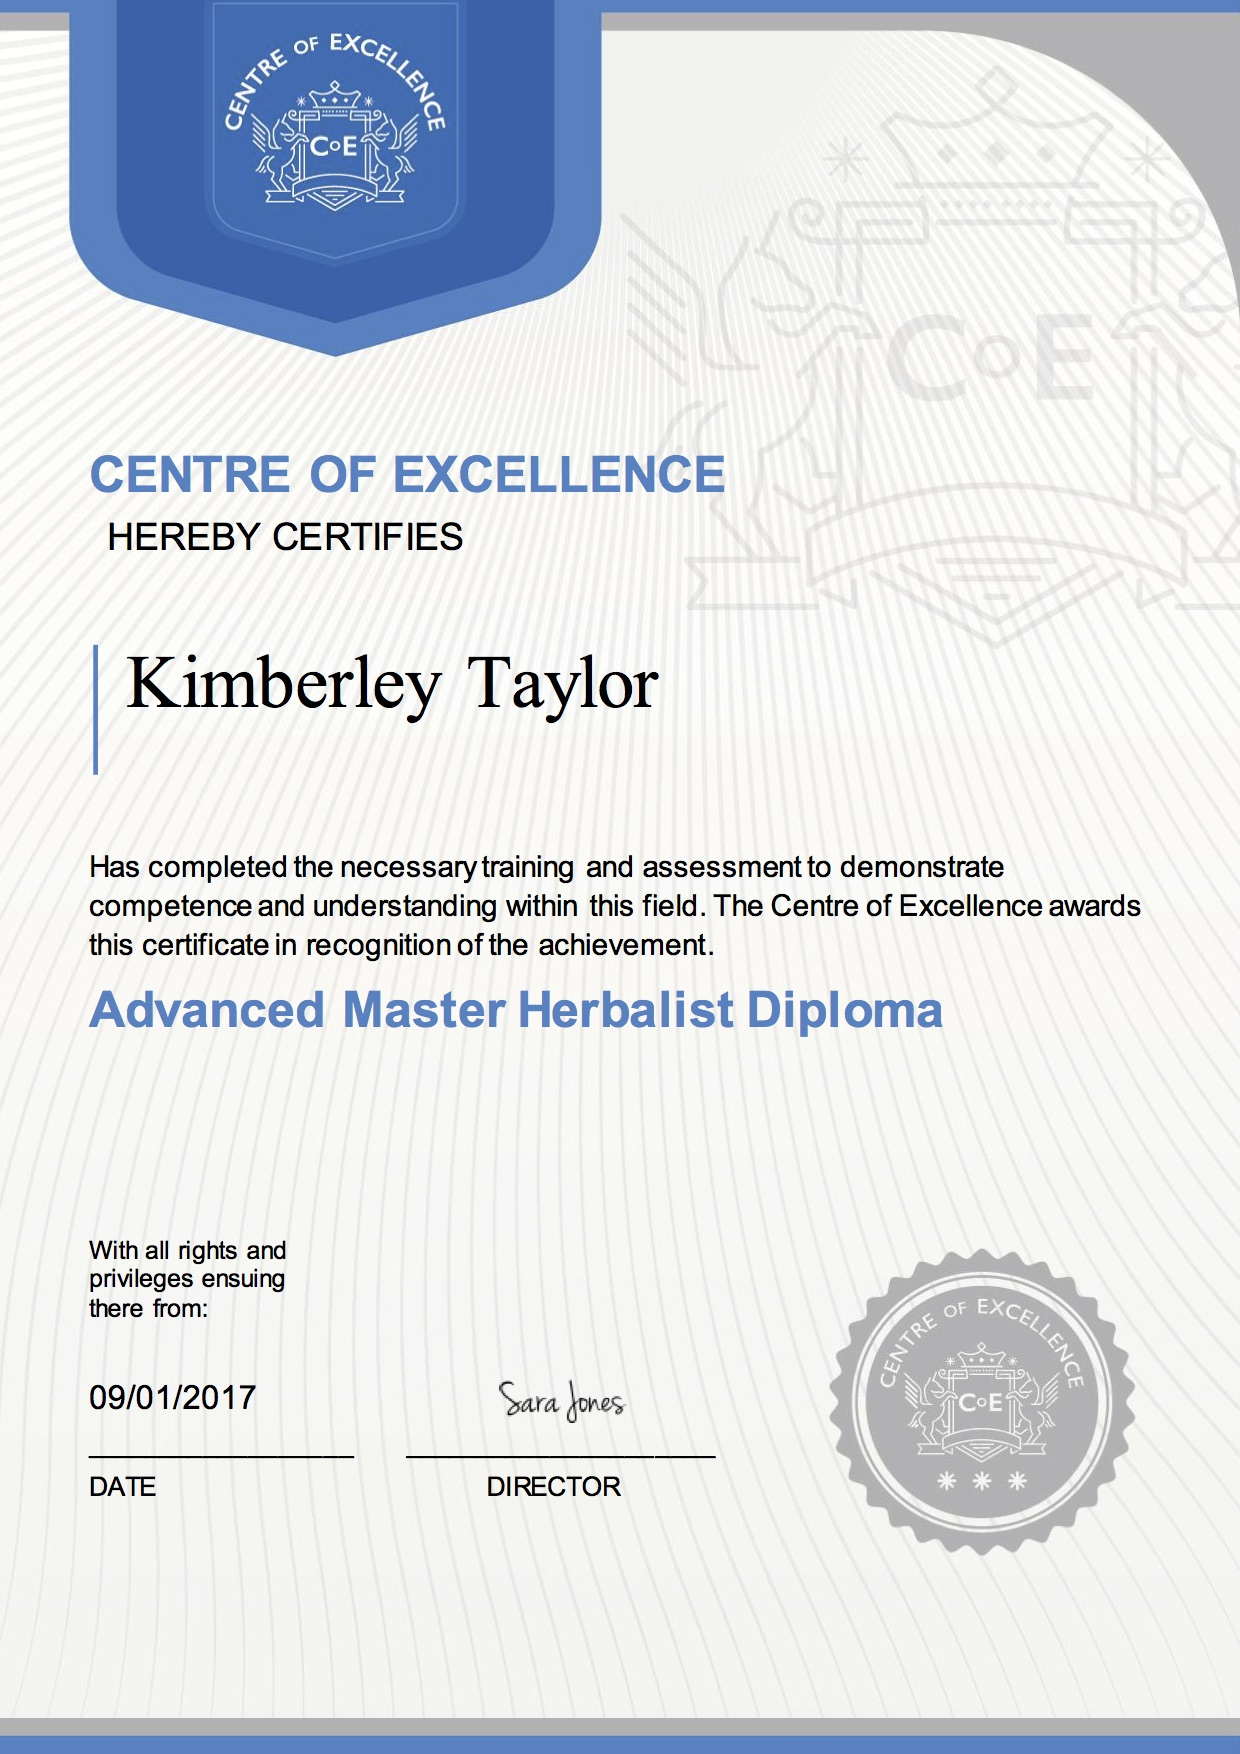 Advanced Master Herbalist Diploma Kimberley Taylor